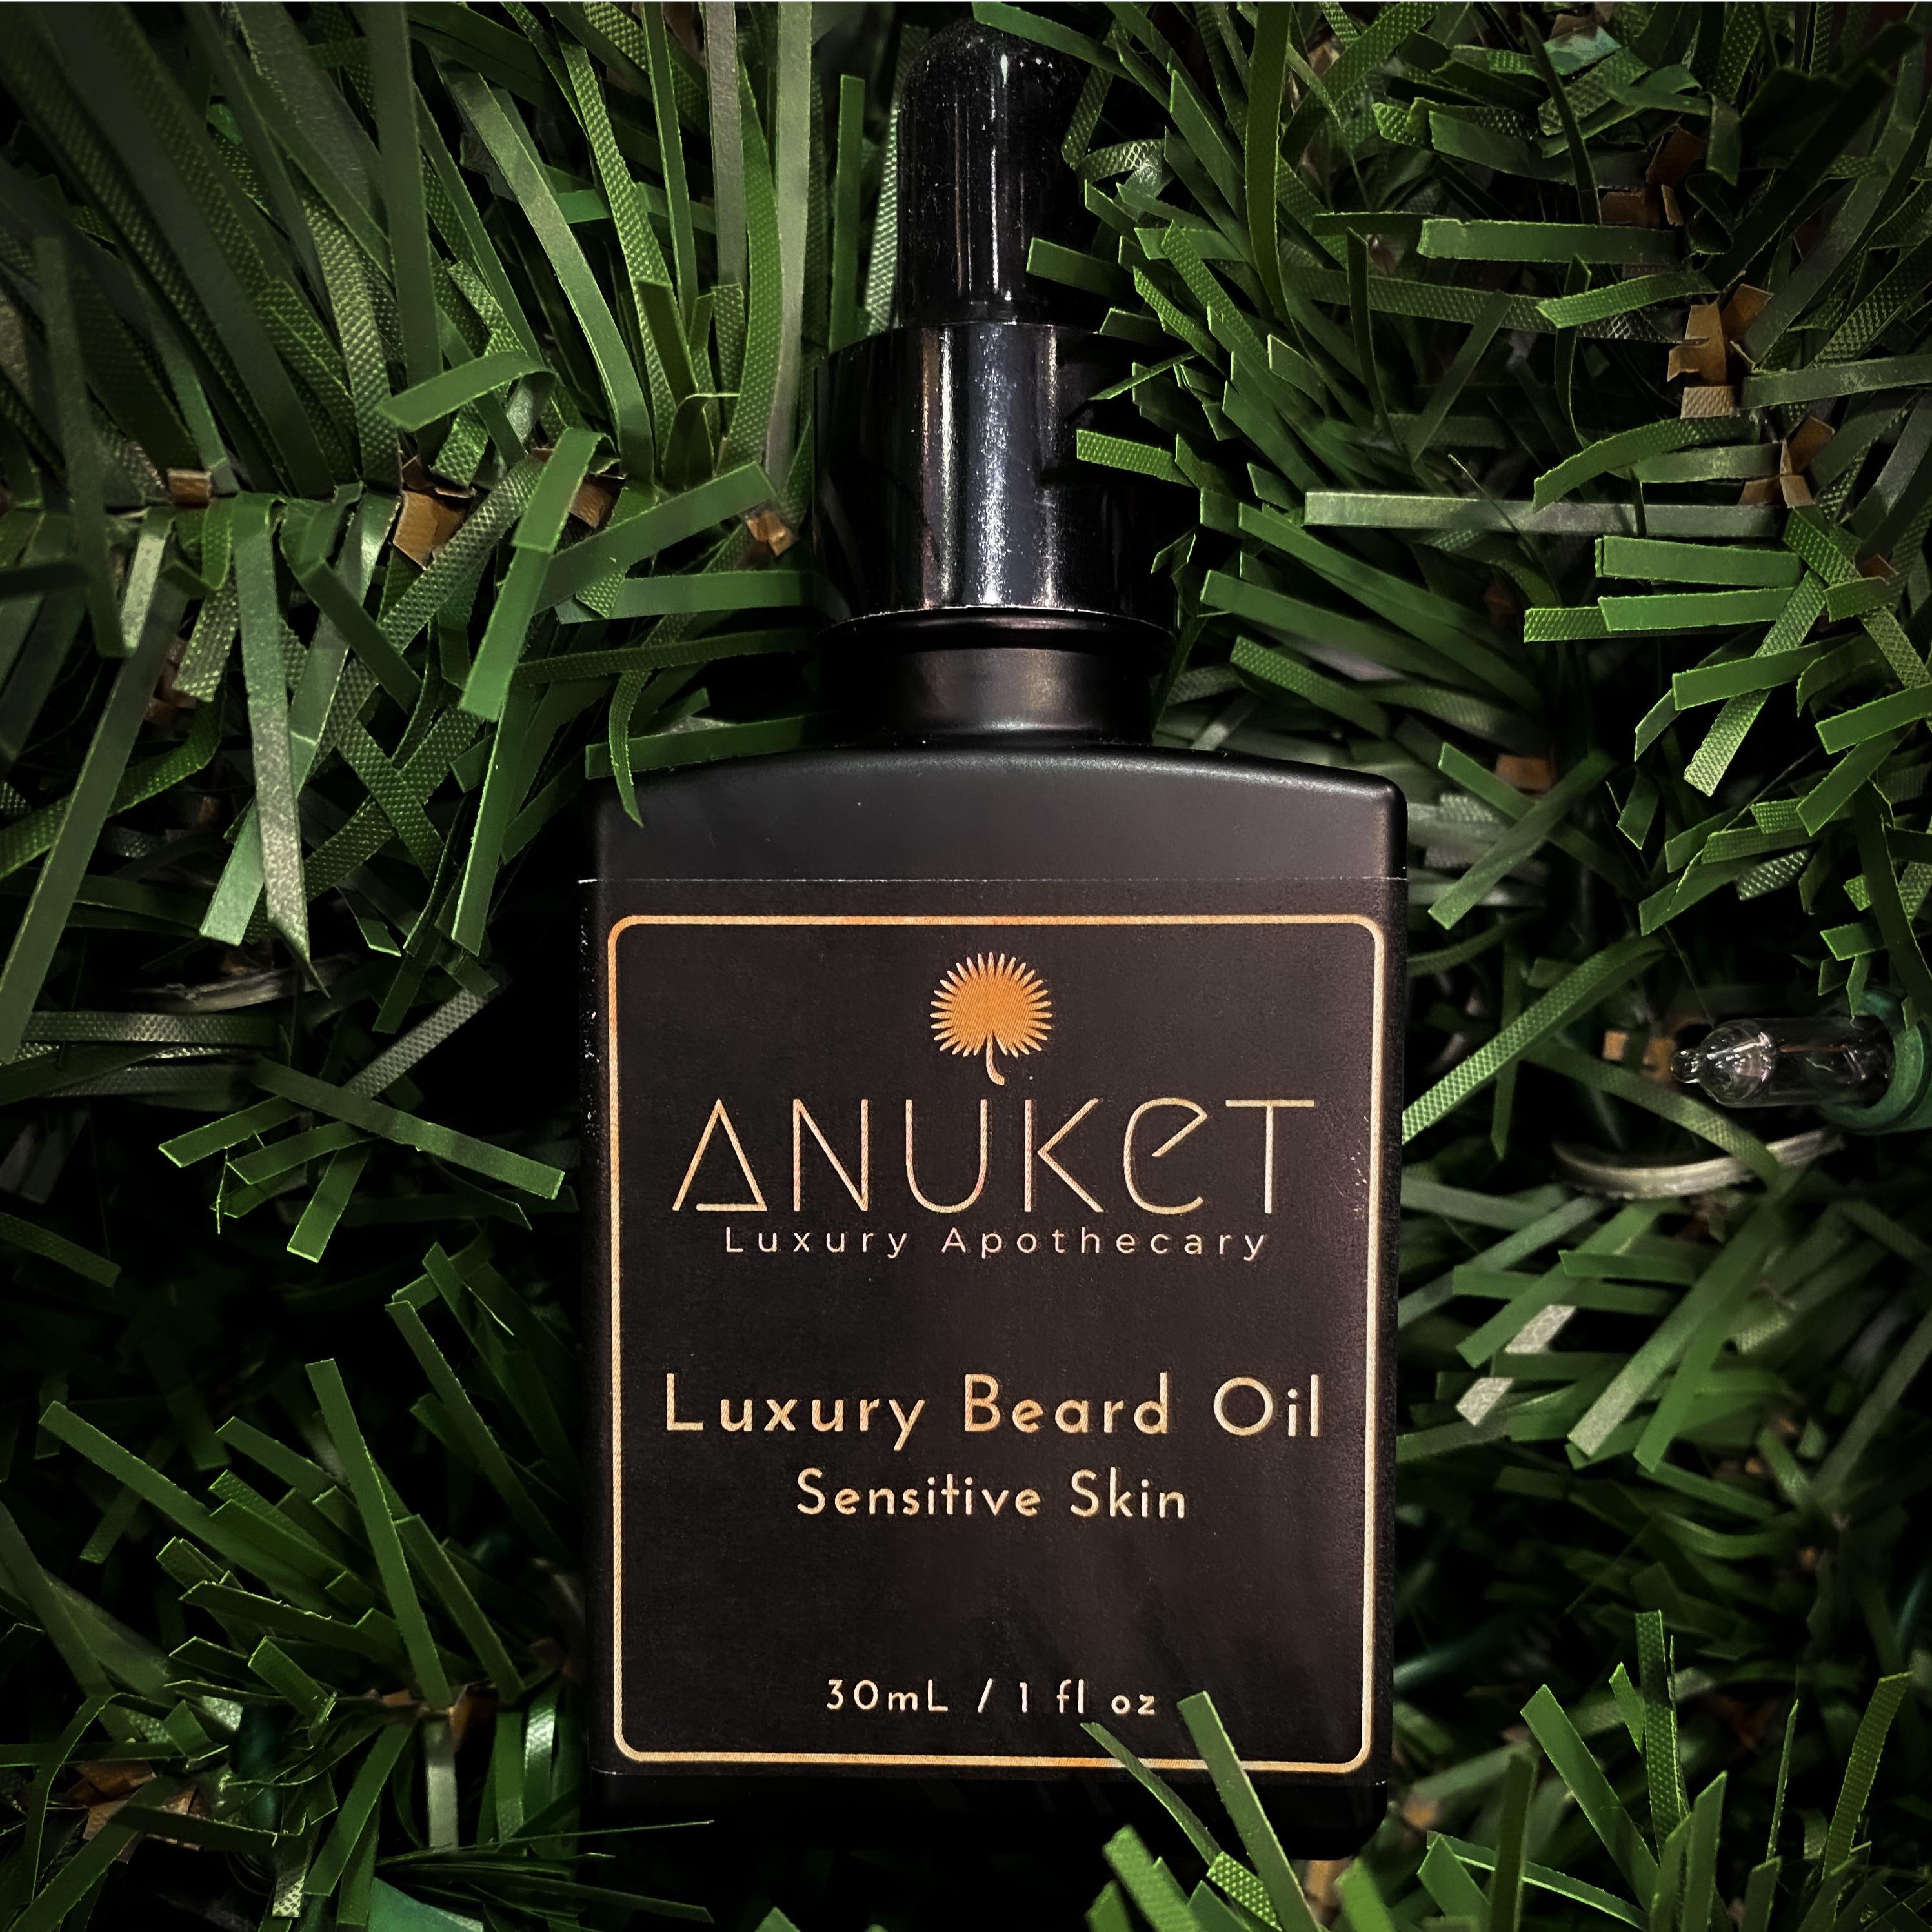 Image of Anuket Luxury Apothecary's Sensitive Formula Luxury Beard Oil laying on a background of greenery